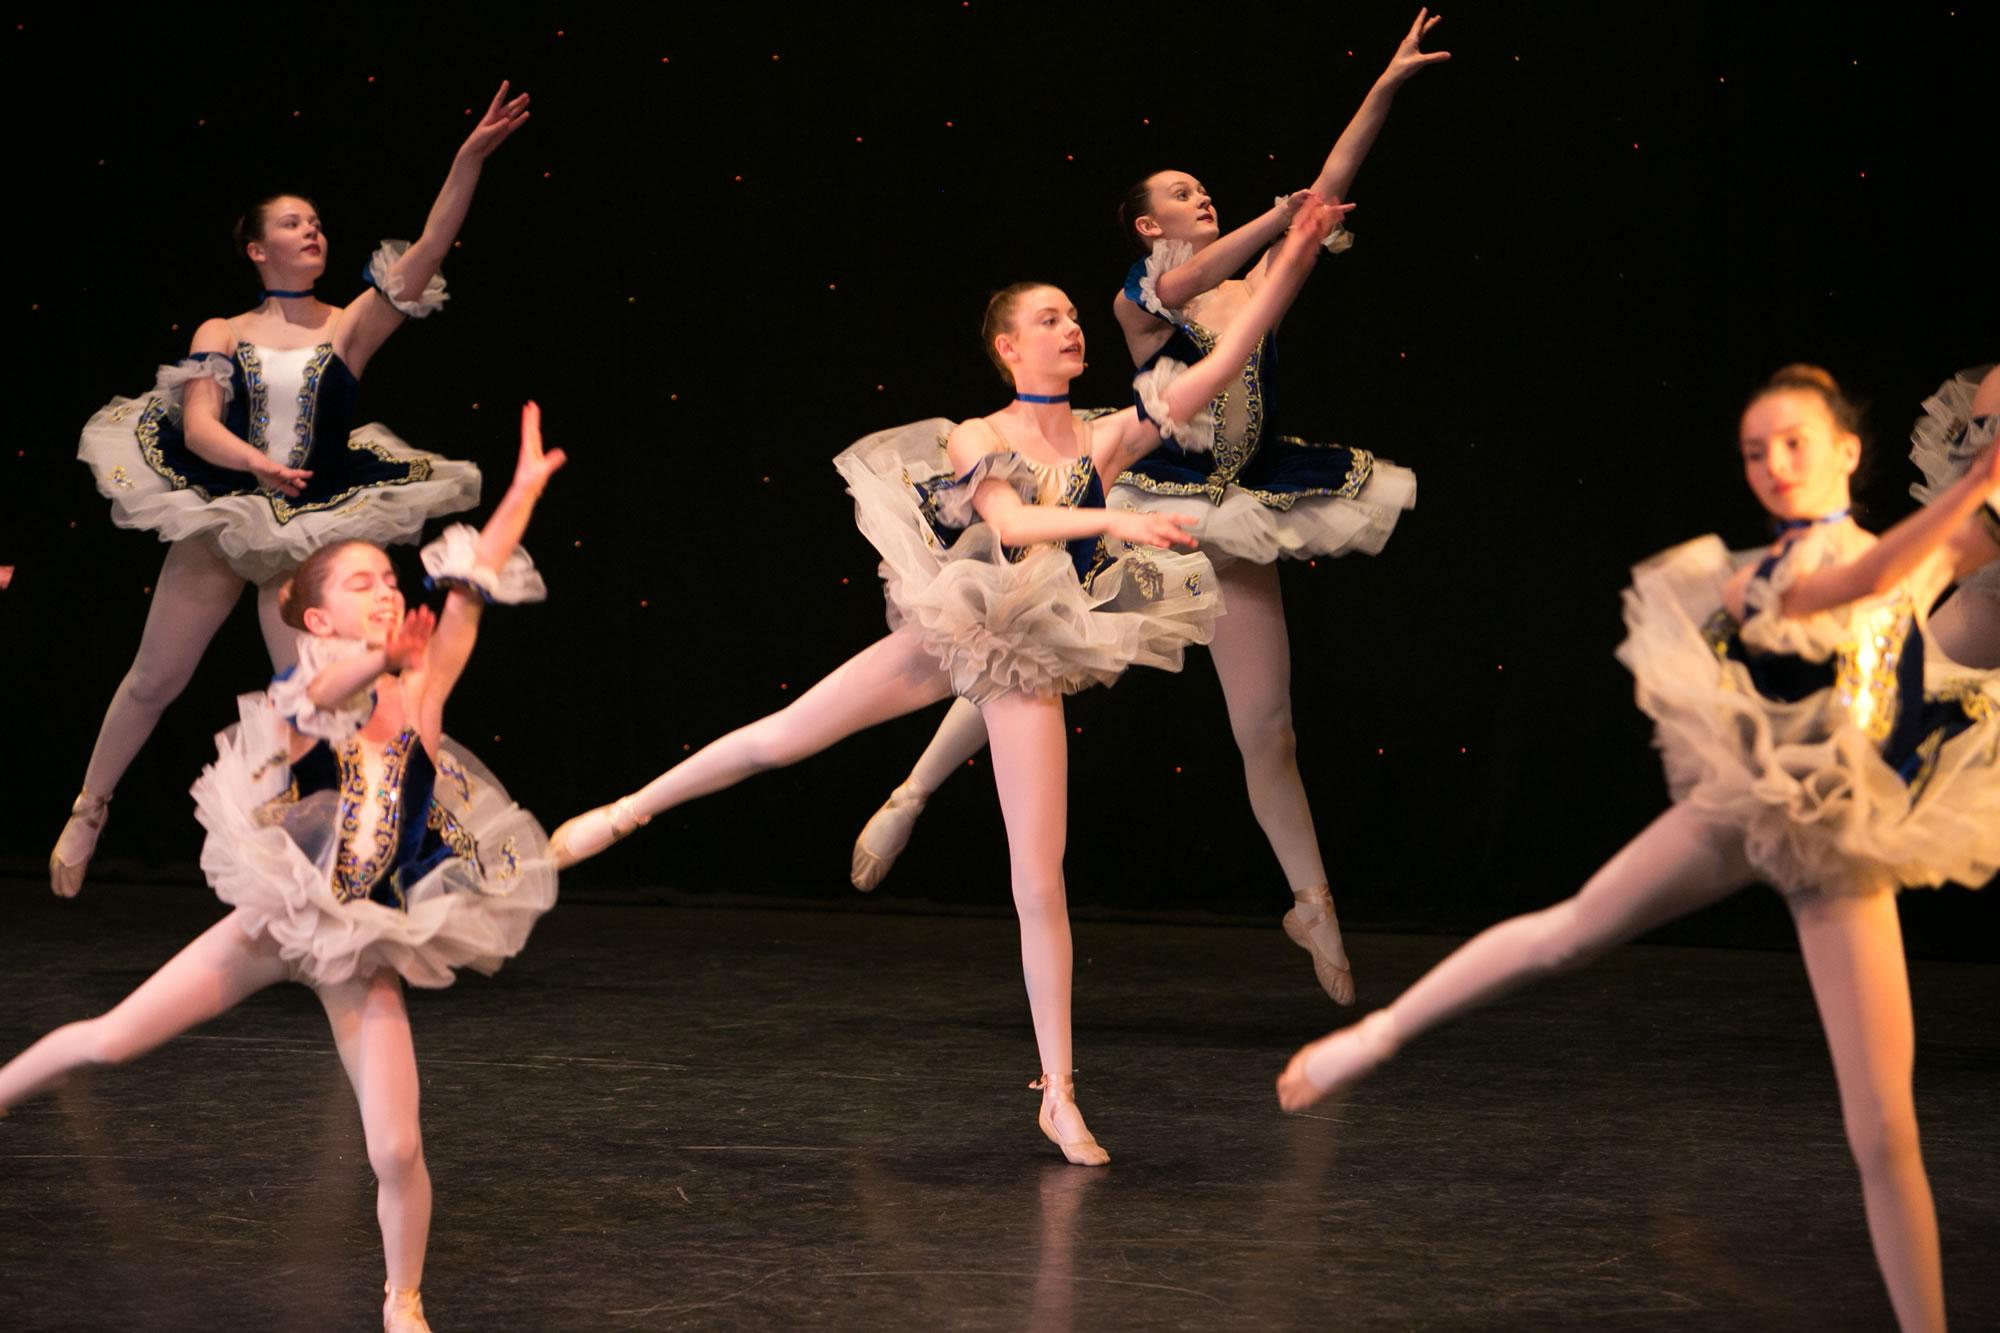 Hitchin_School_of_Dance_Show_2019-SM1_2859.jpg